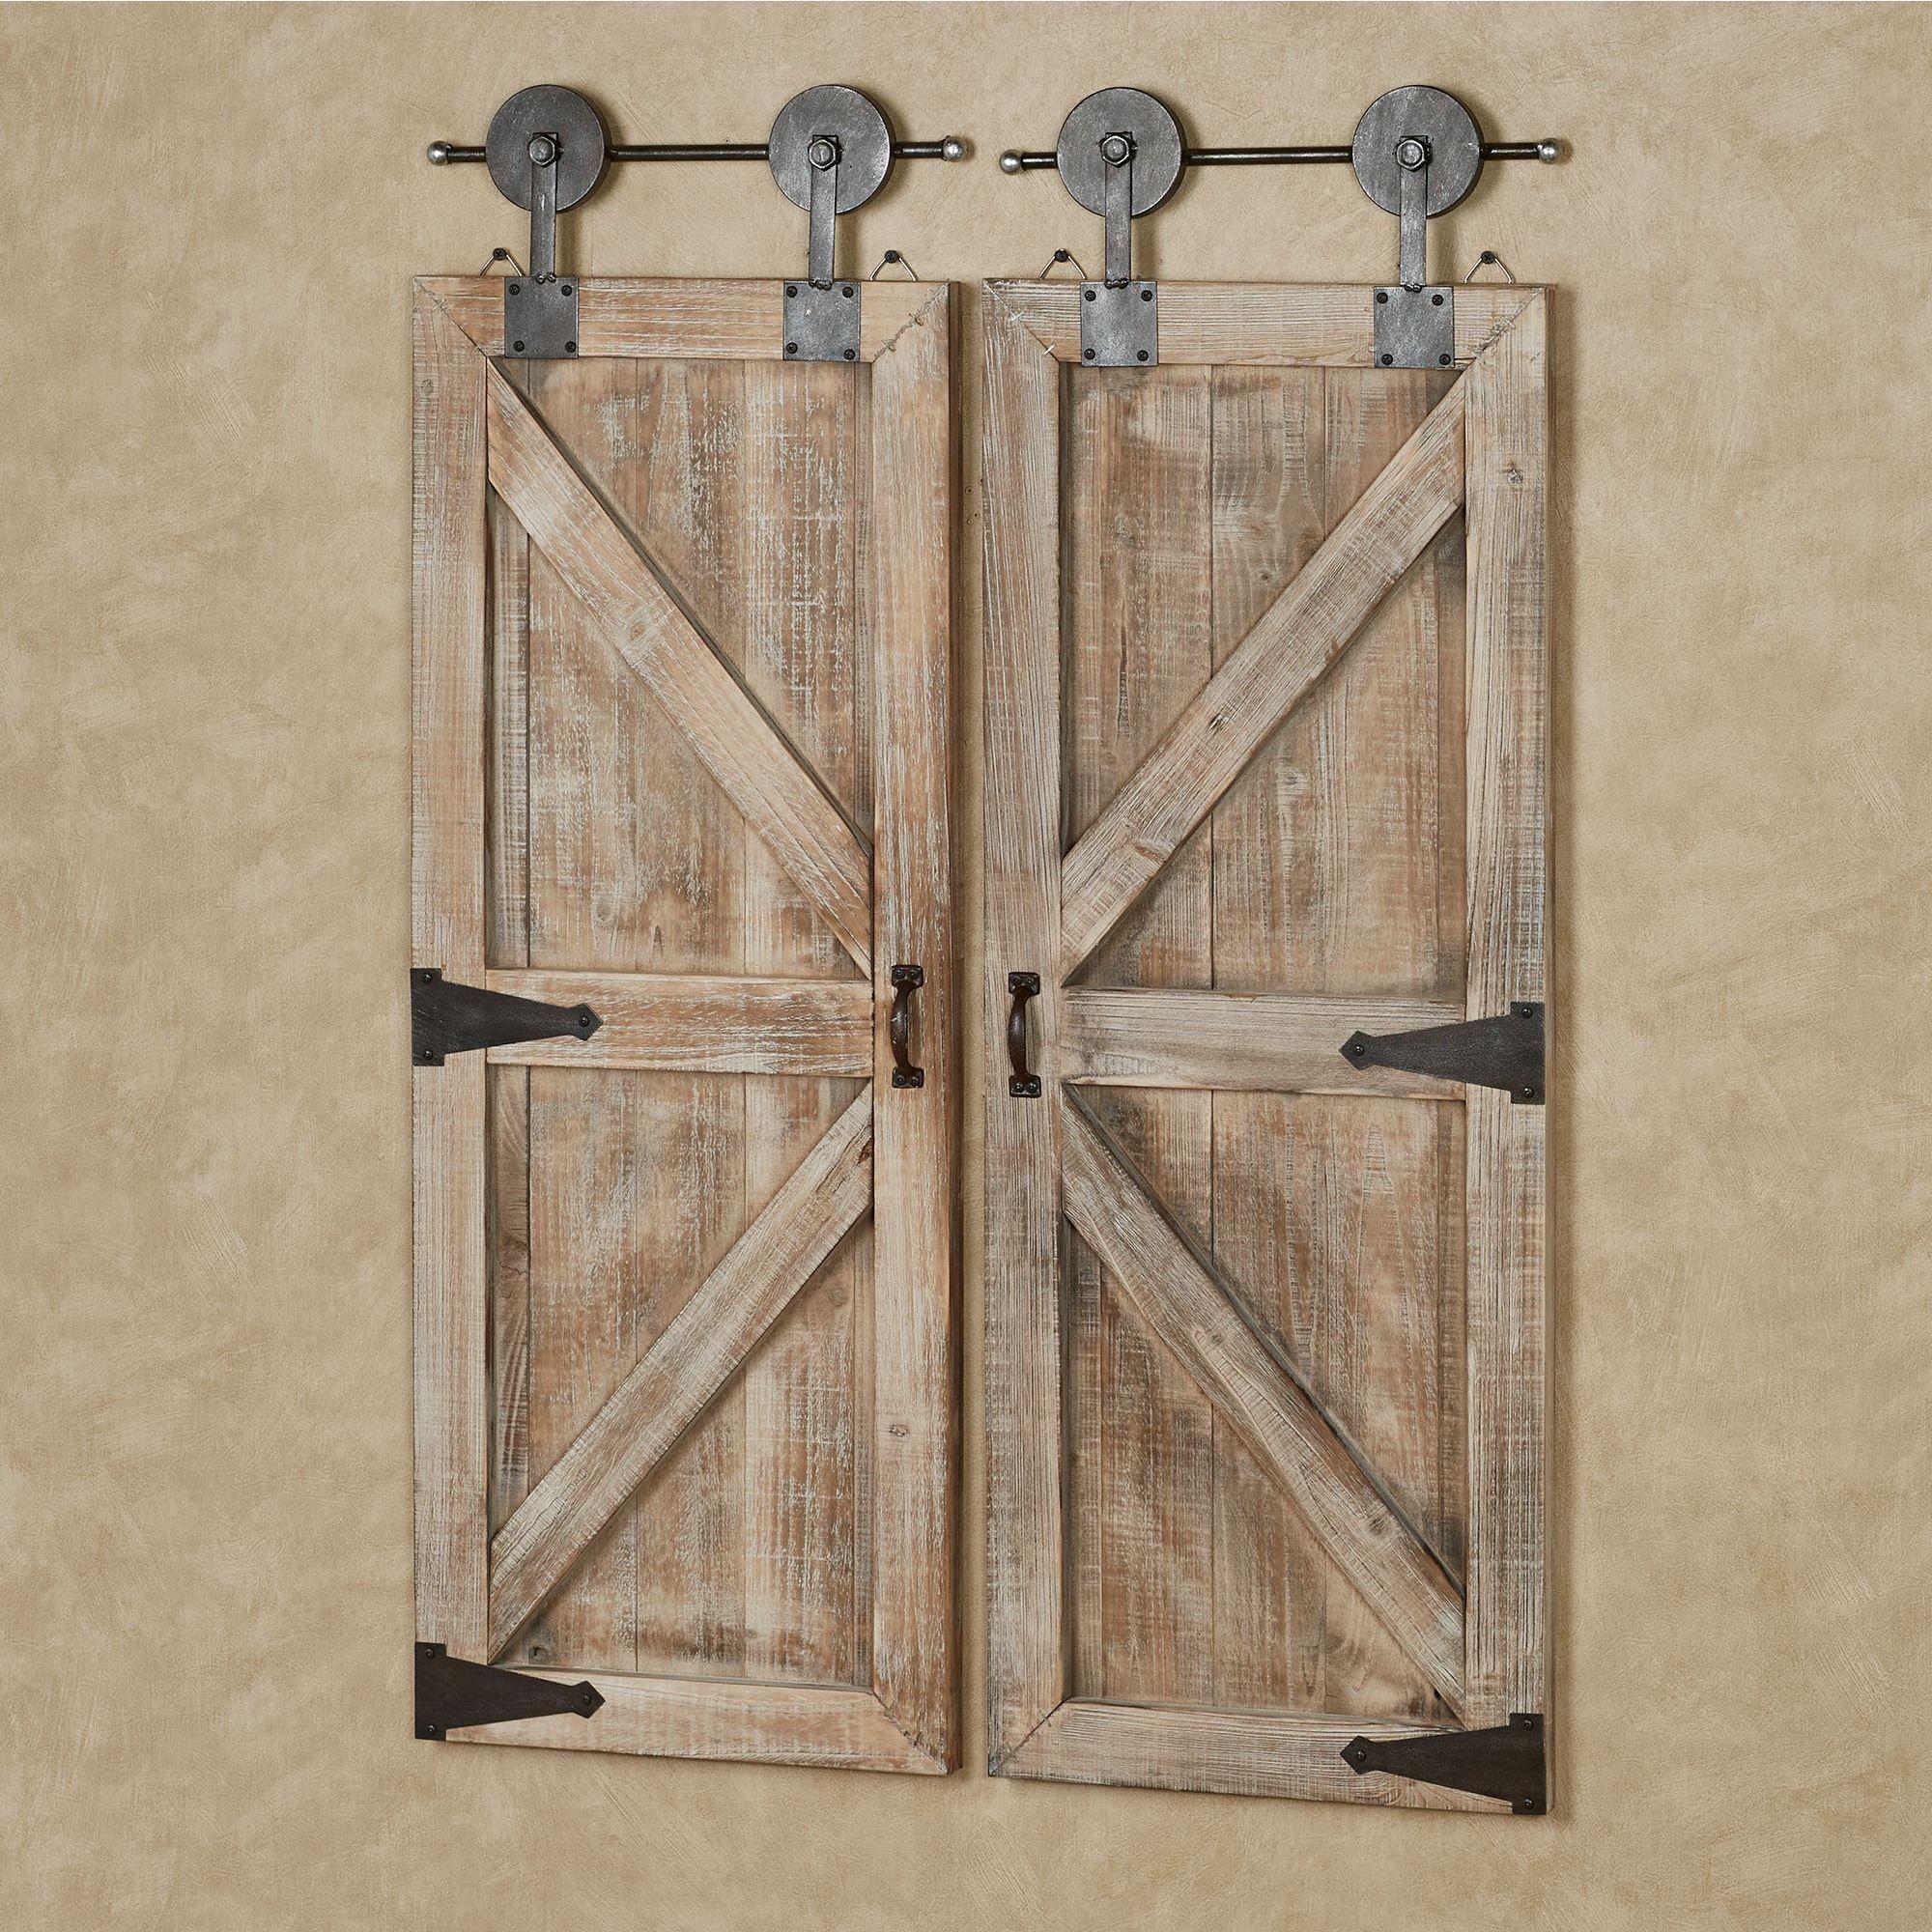 Accent Wall Behind Barn Doors: Sliding Barn Door Farmhouse Style Wooden Wall Accent Set